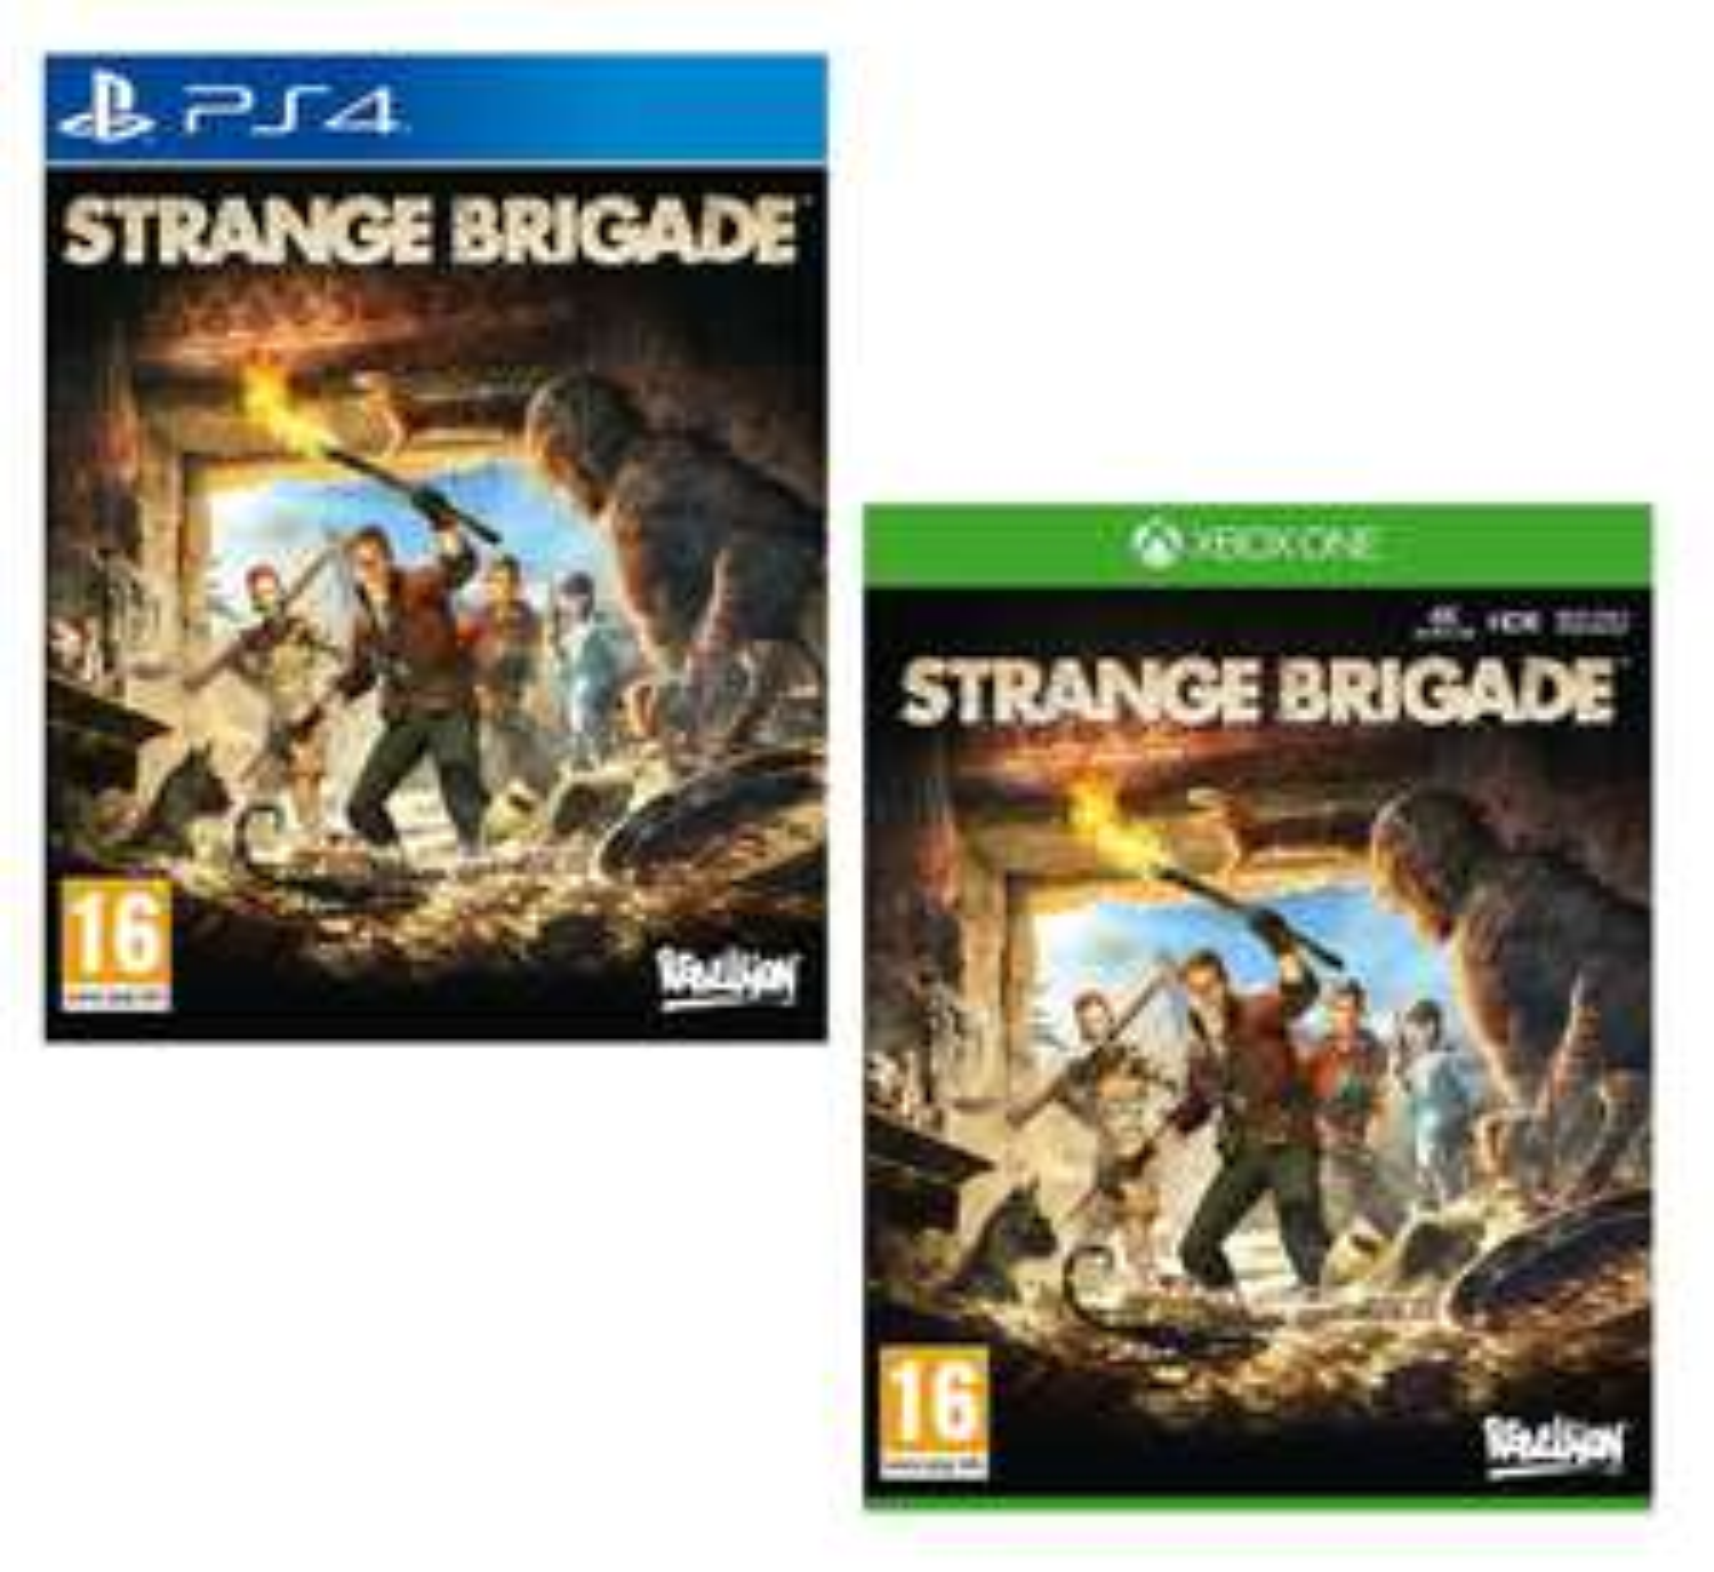 Strange Brigade [PS4/Xbox One] - £5.69 Delivered @ gamingexpressuk / eBay